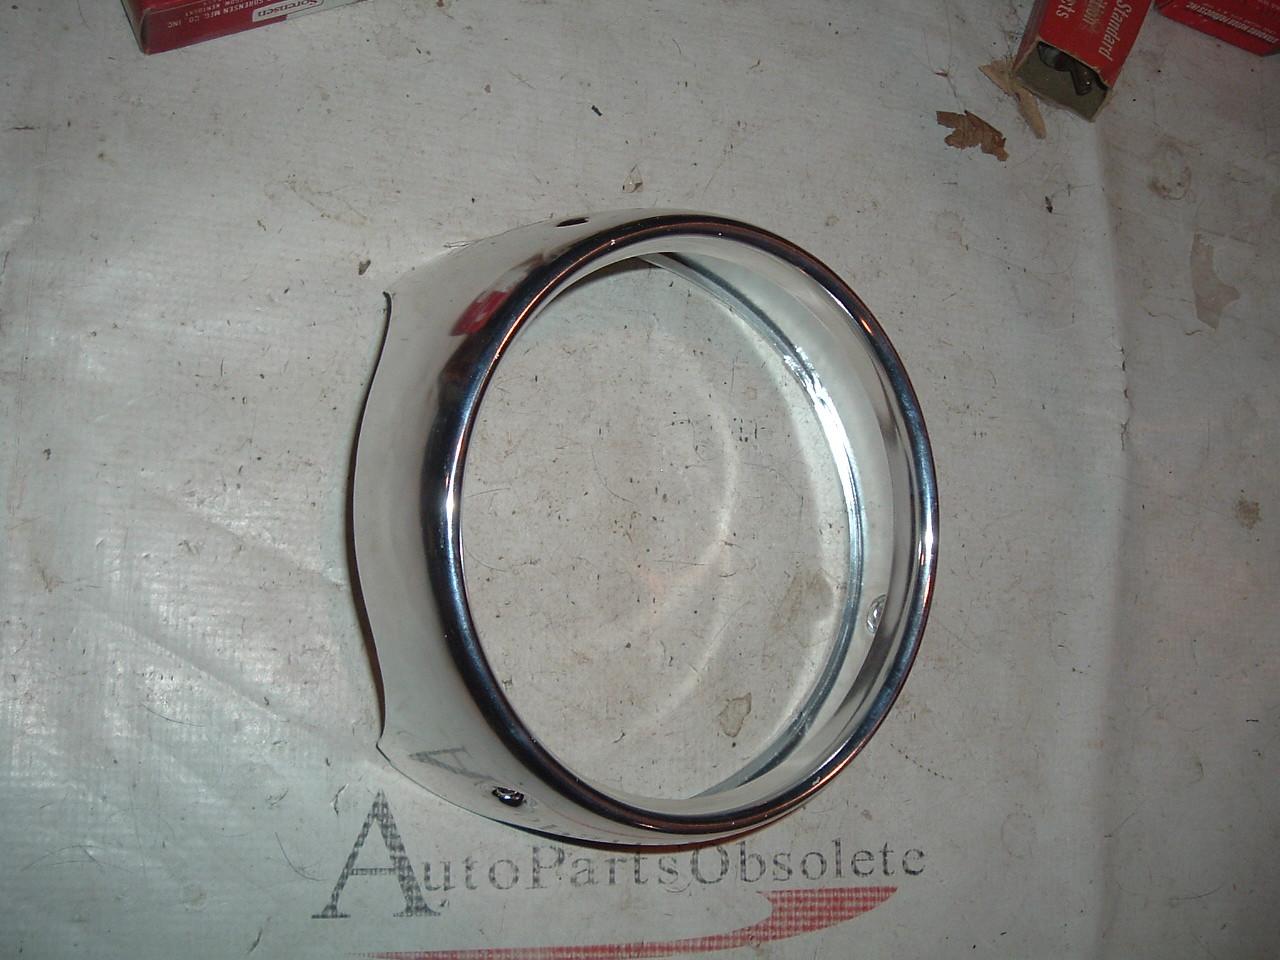 1964 ford galaixe headlight door cover C4AZ-13064-B (z c4az13064b)